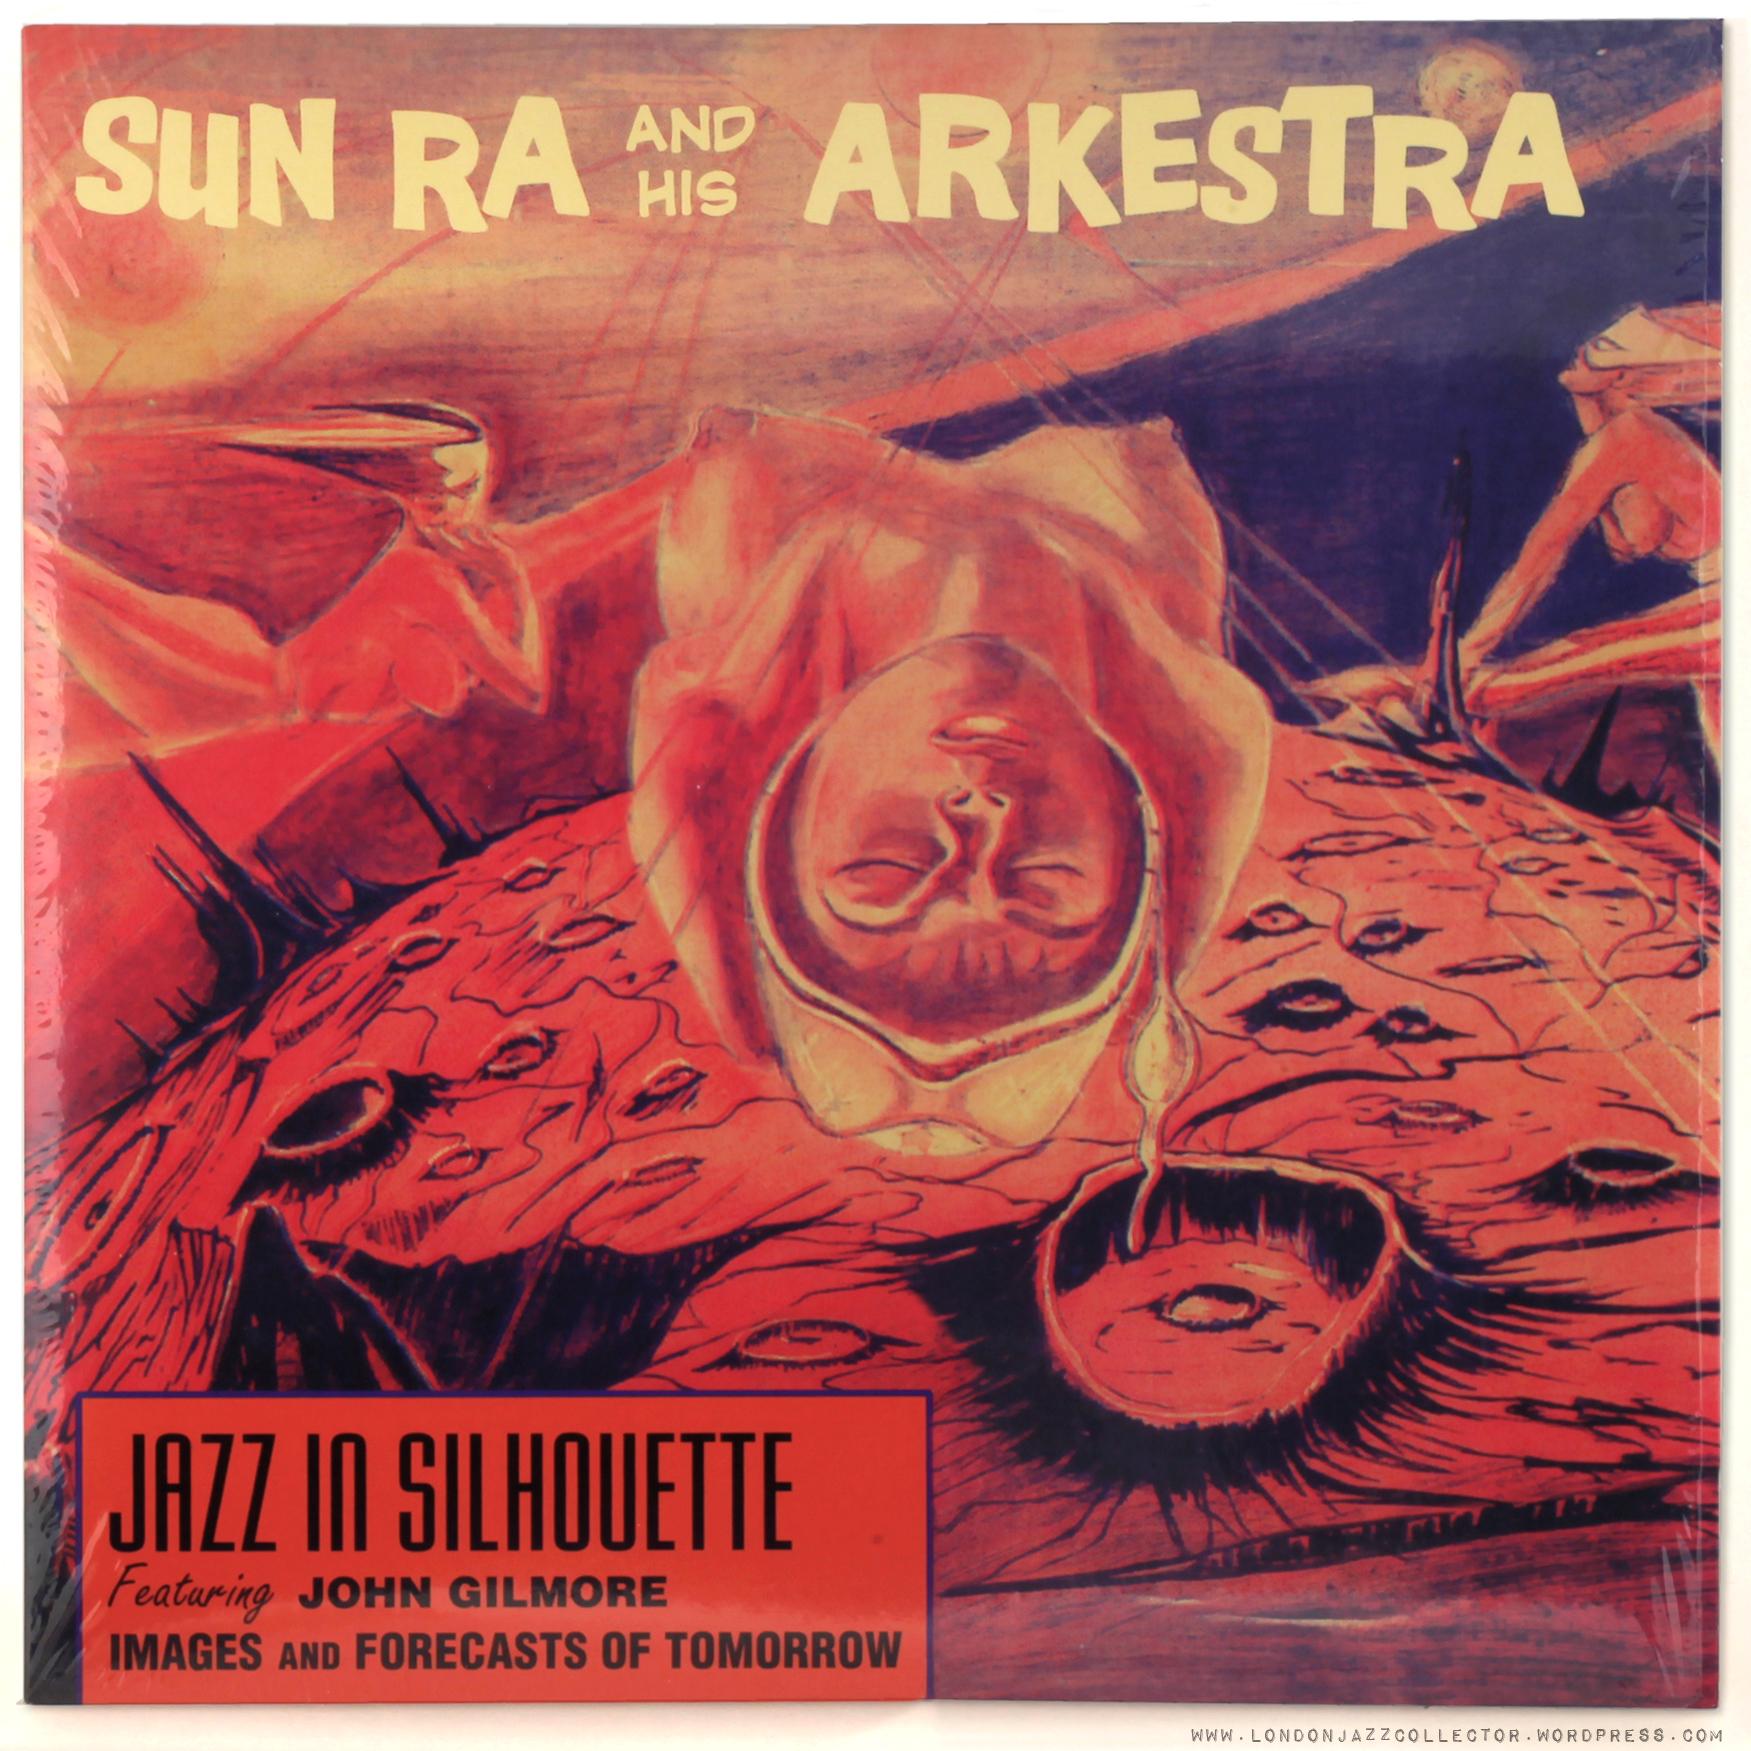 A rodar XLI - Página 5 Sun-ra-jazz-in-silhouette-dol-ru-ljc-1800